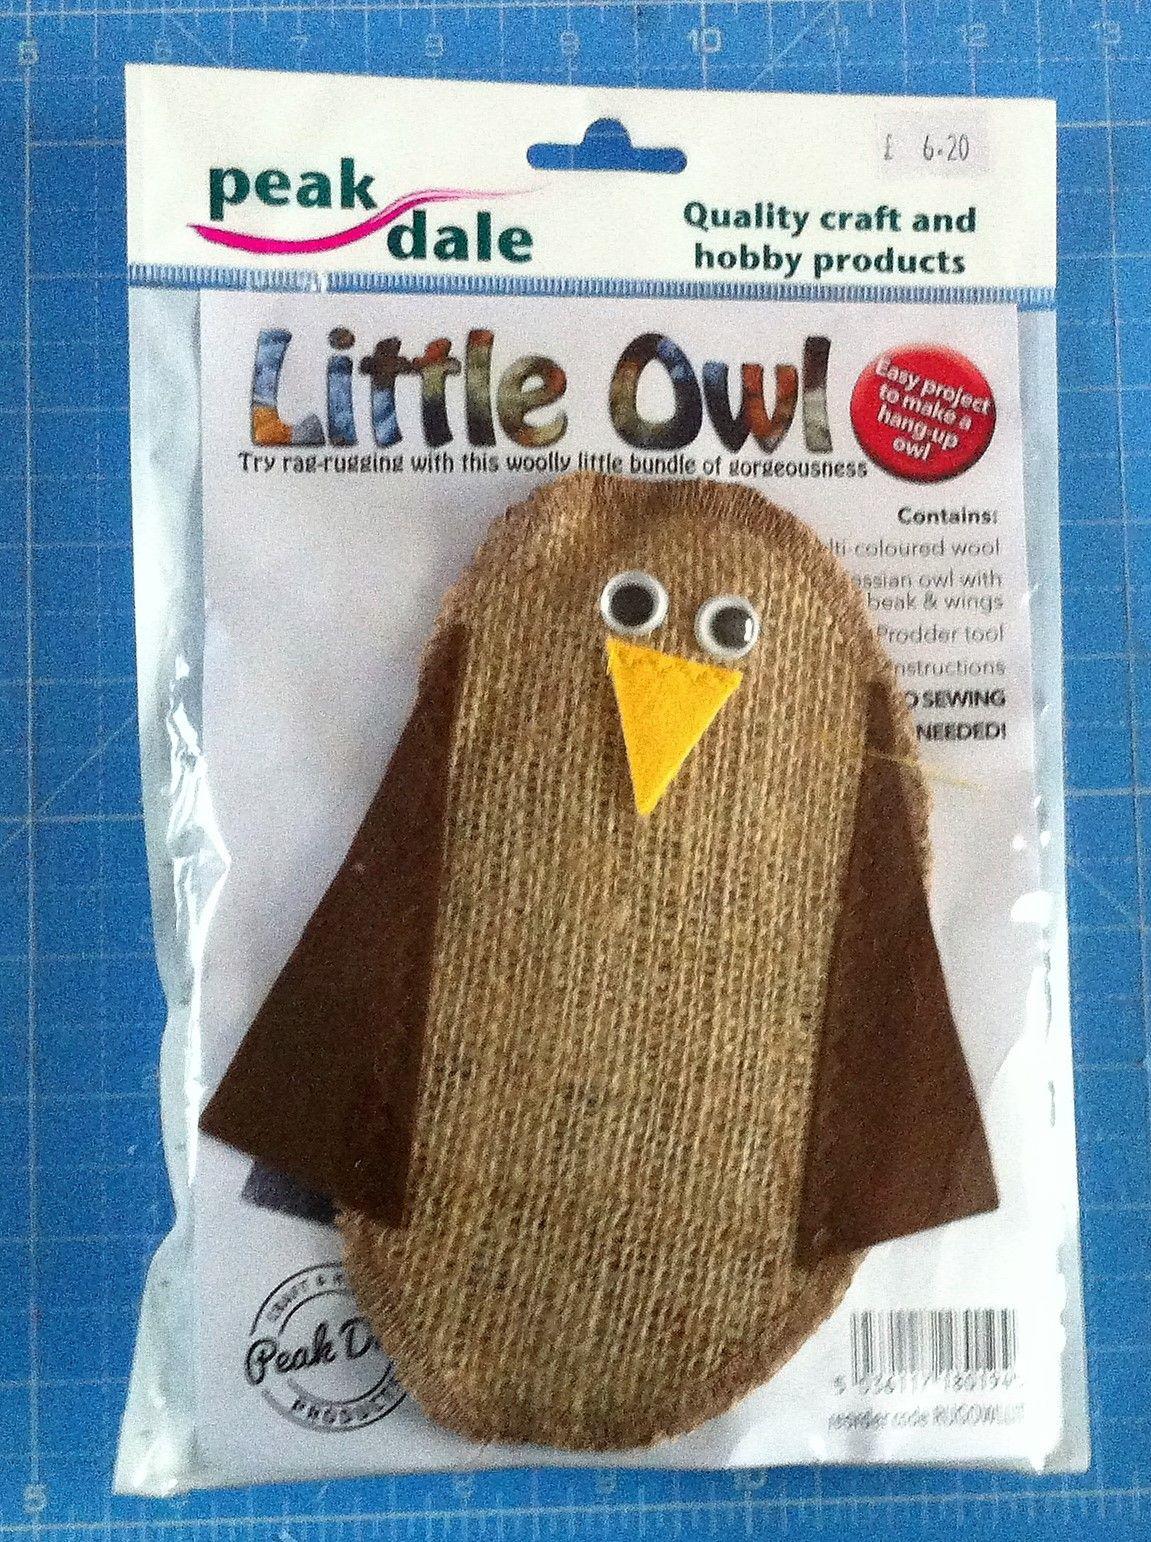 kit 3001 little owl rag rugging kit by peak dale